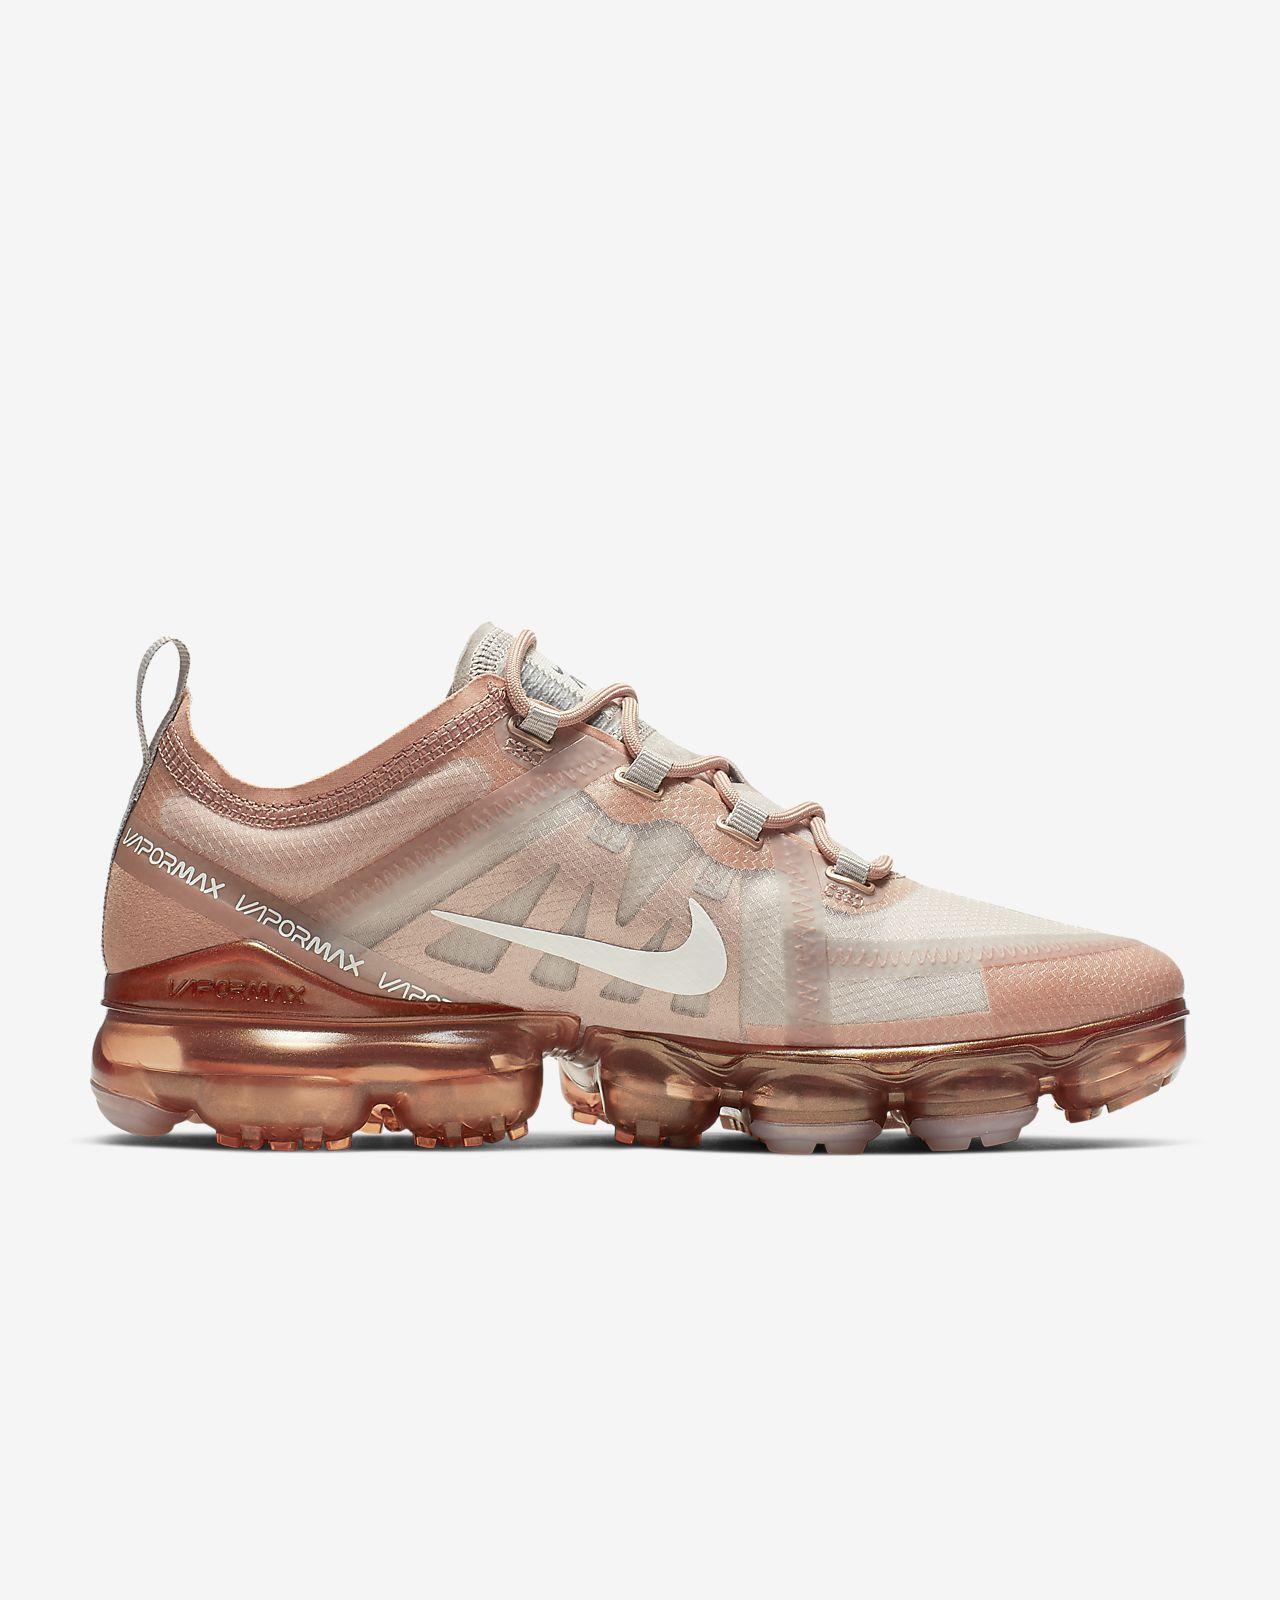 3827e000c75ef Nike Air VaporMax 2019 Women s Shoe. Nike.com AU